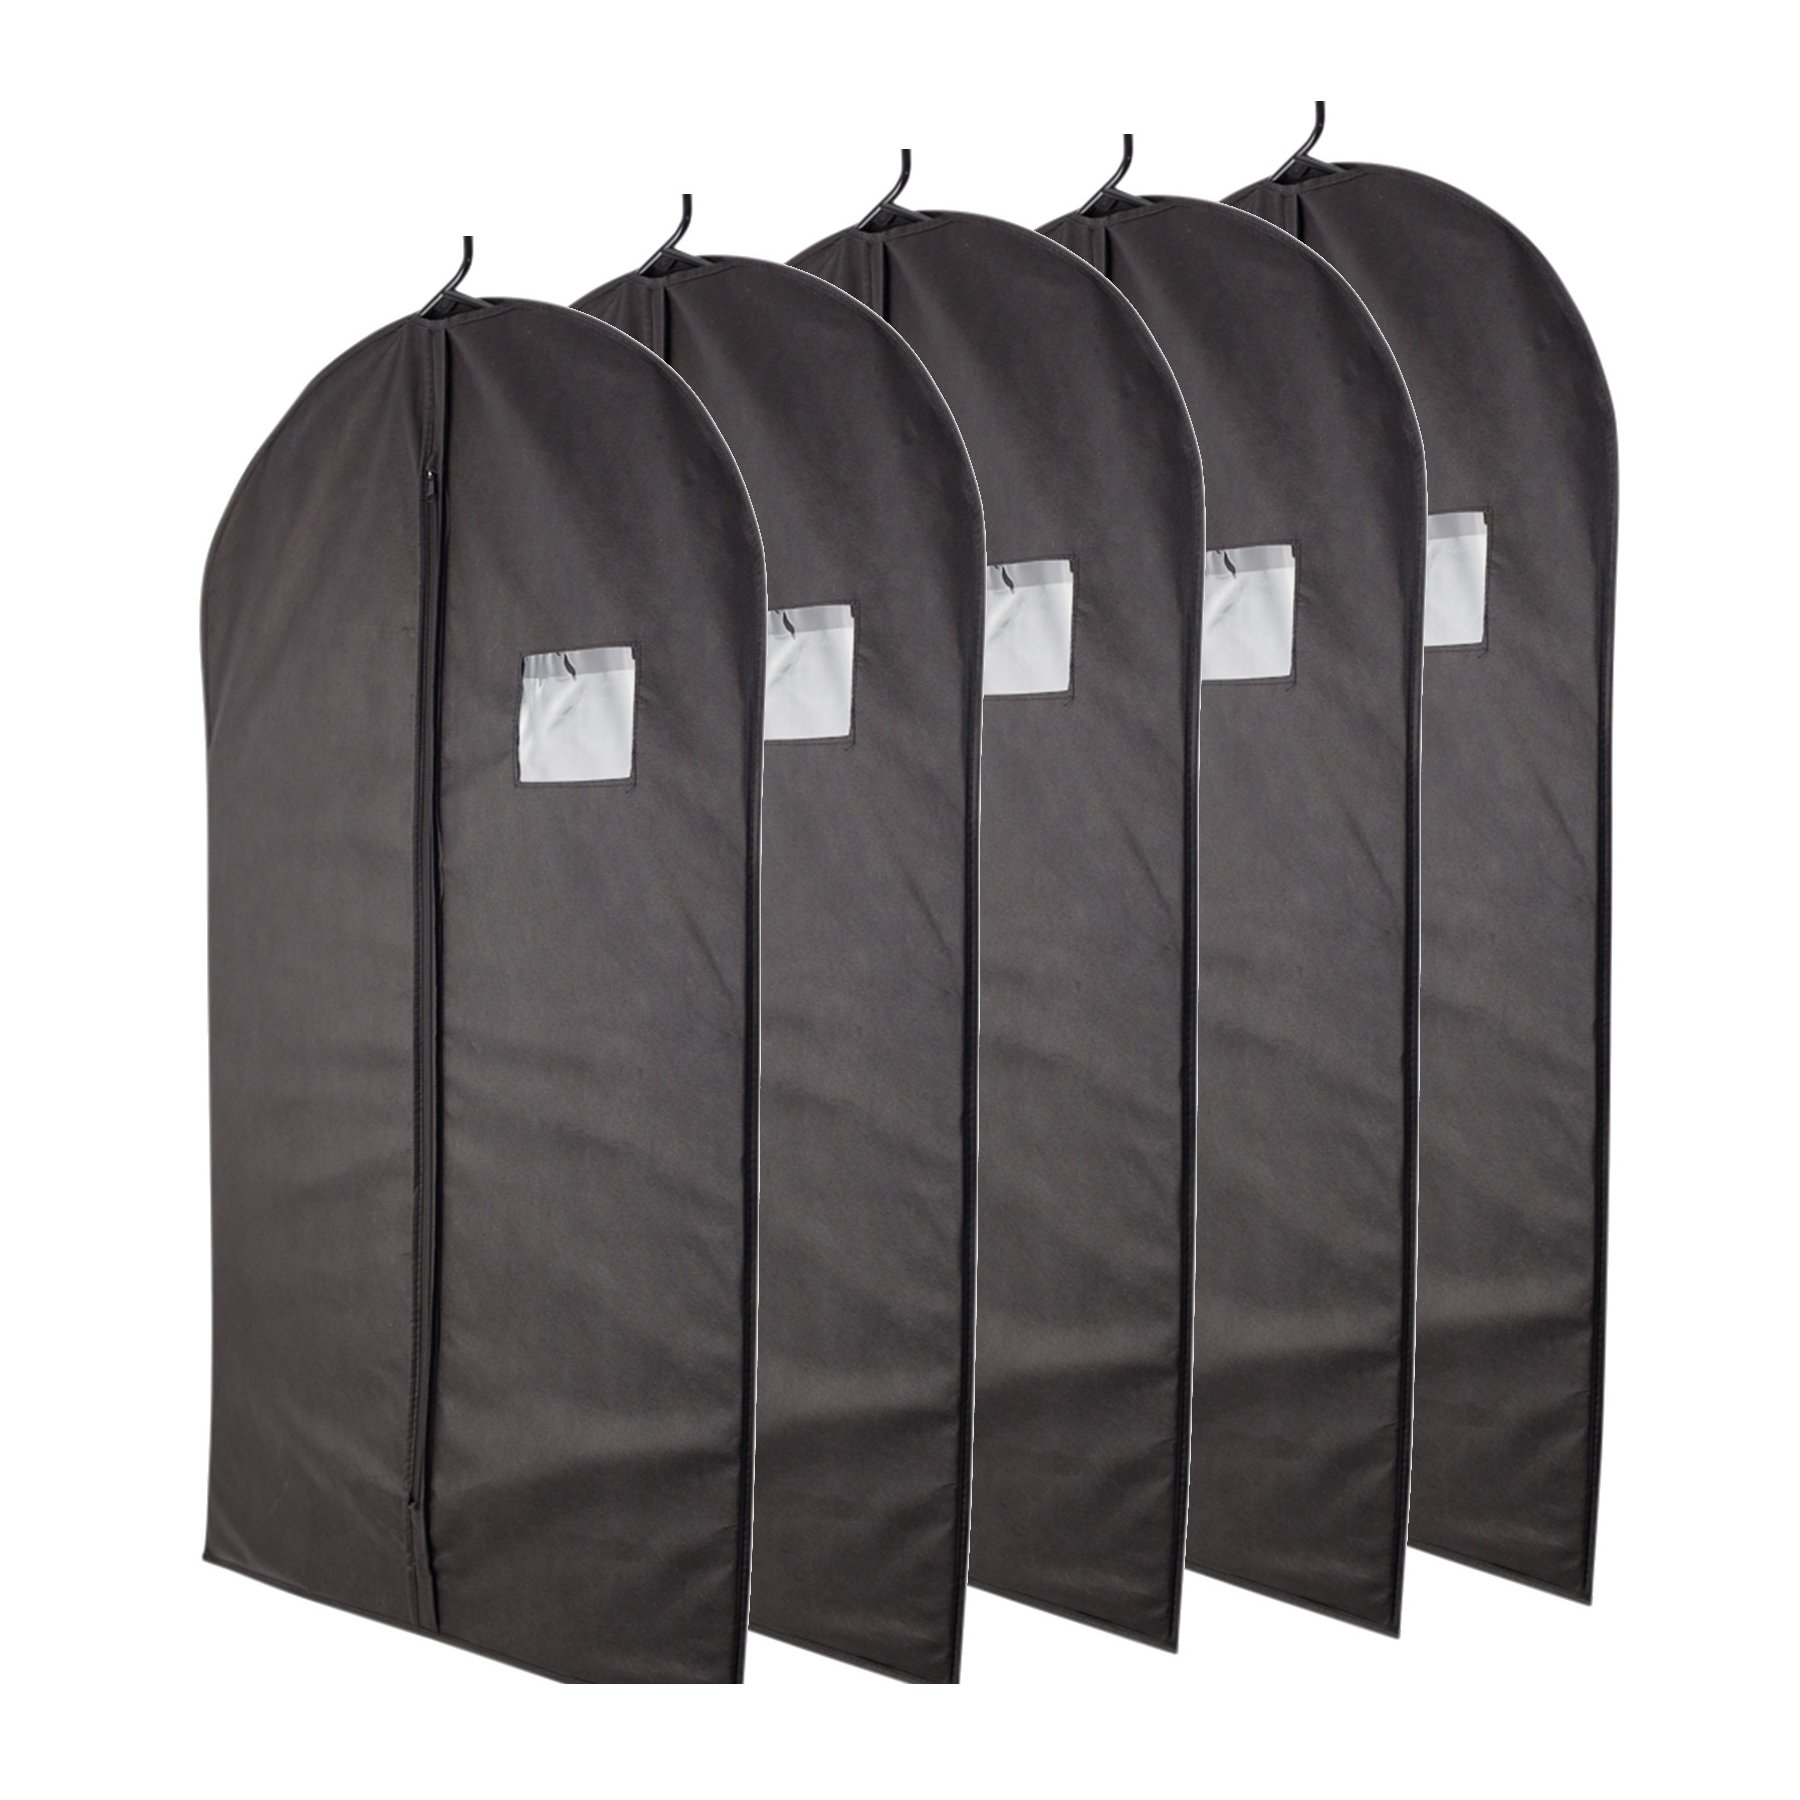 "Plixio 40"" Black Garment Bags for Breathable Storage of Suits, Dresses & Dance Costumes—Includes Zipper & Transparent Window (Pack of 5)"